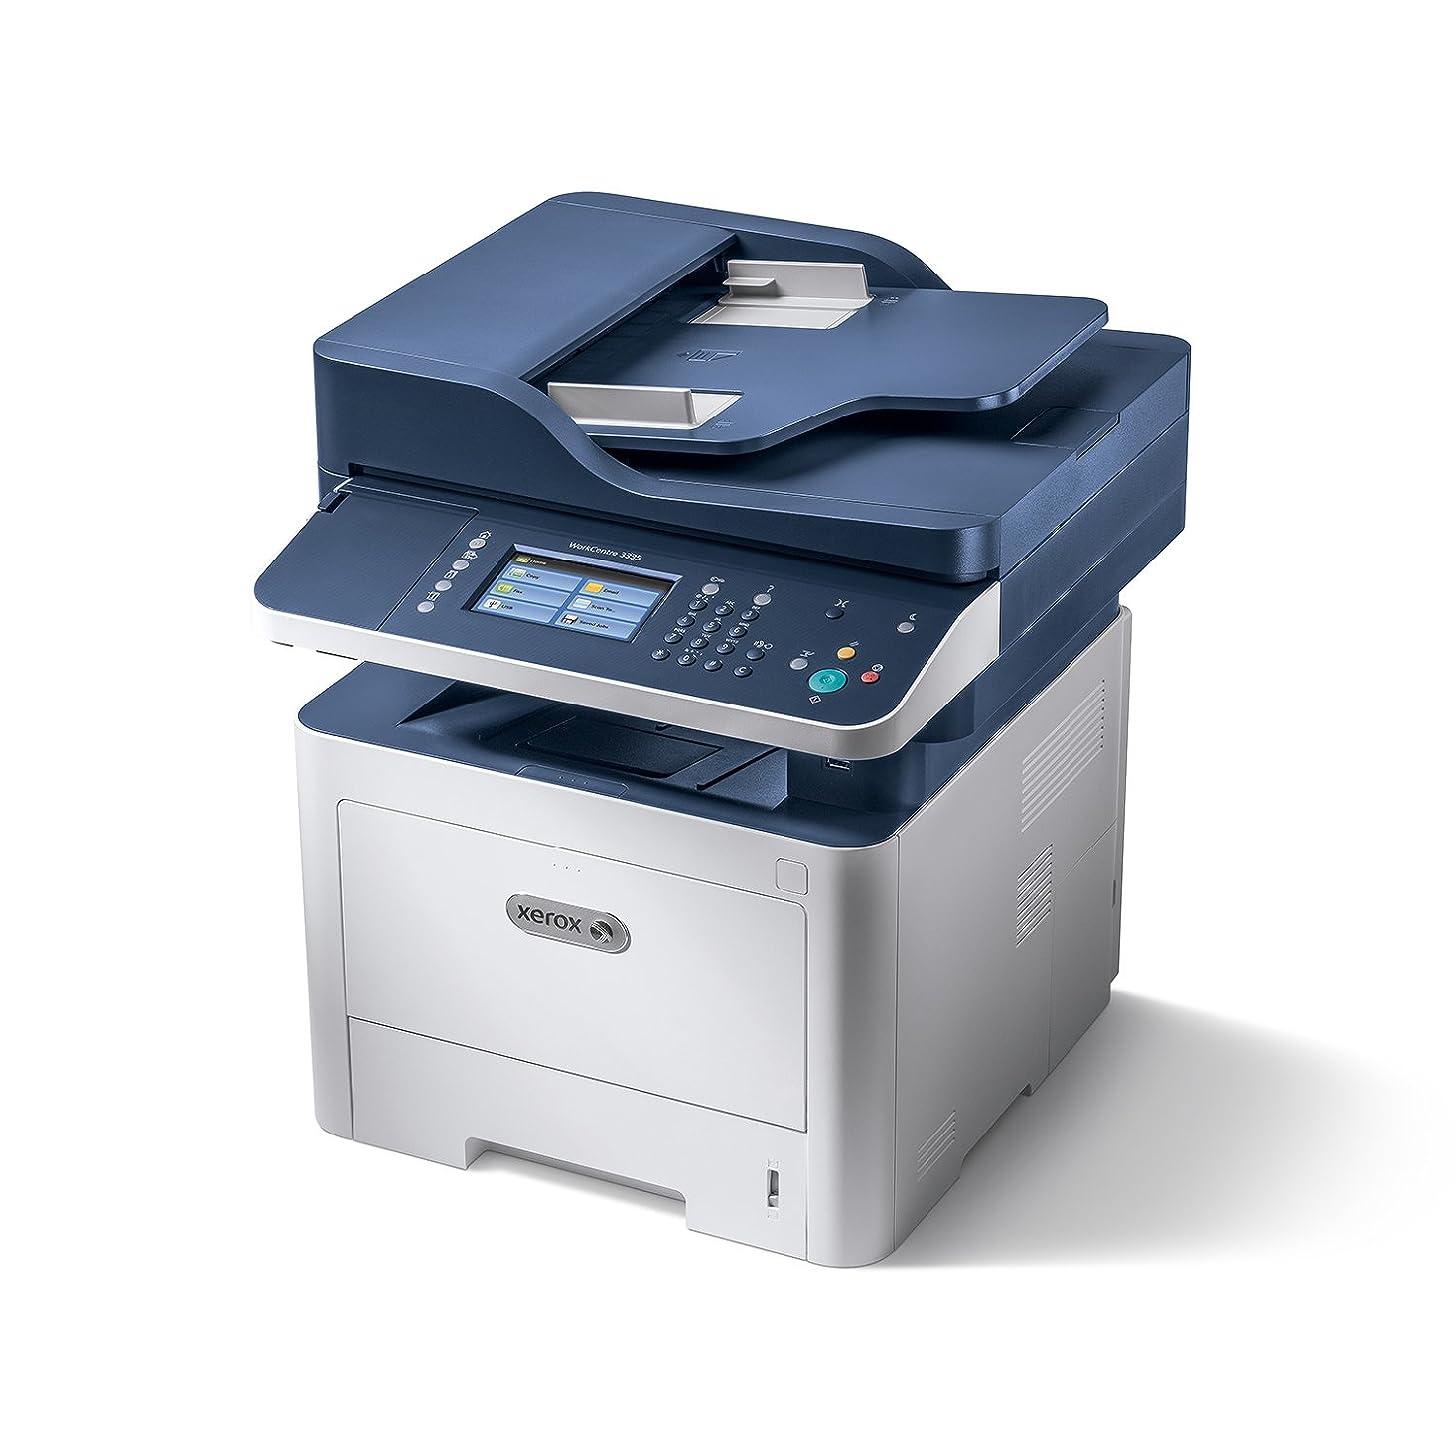 Xerox 3335/DNI WorkCentre Monochrome Multifunction Printer, Blue/White